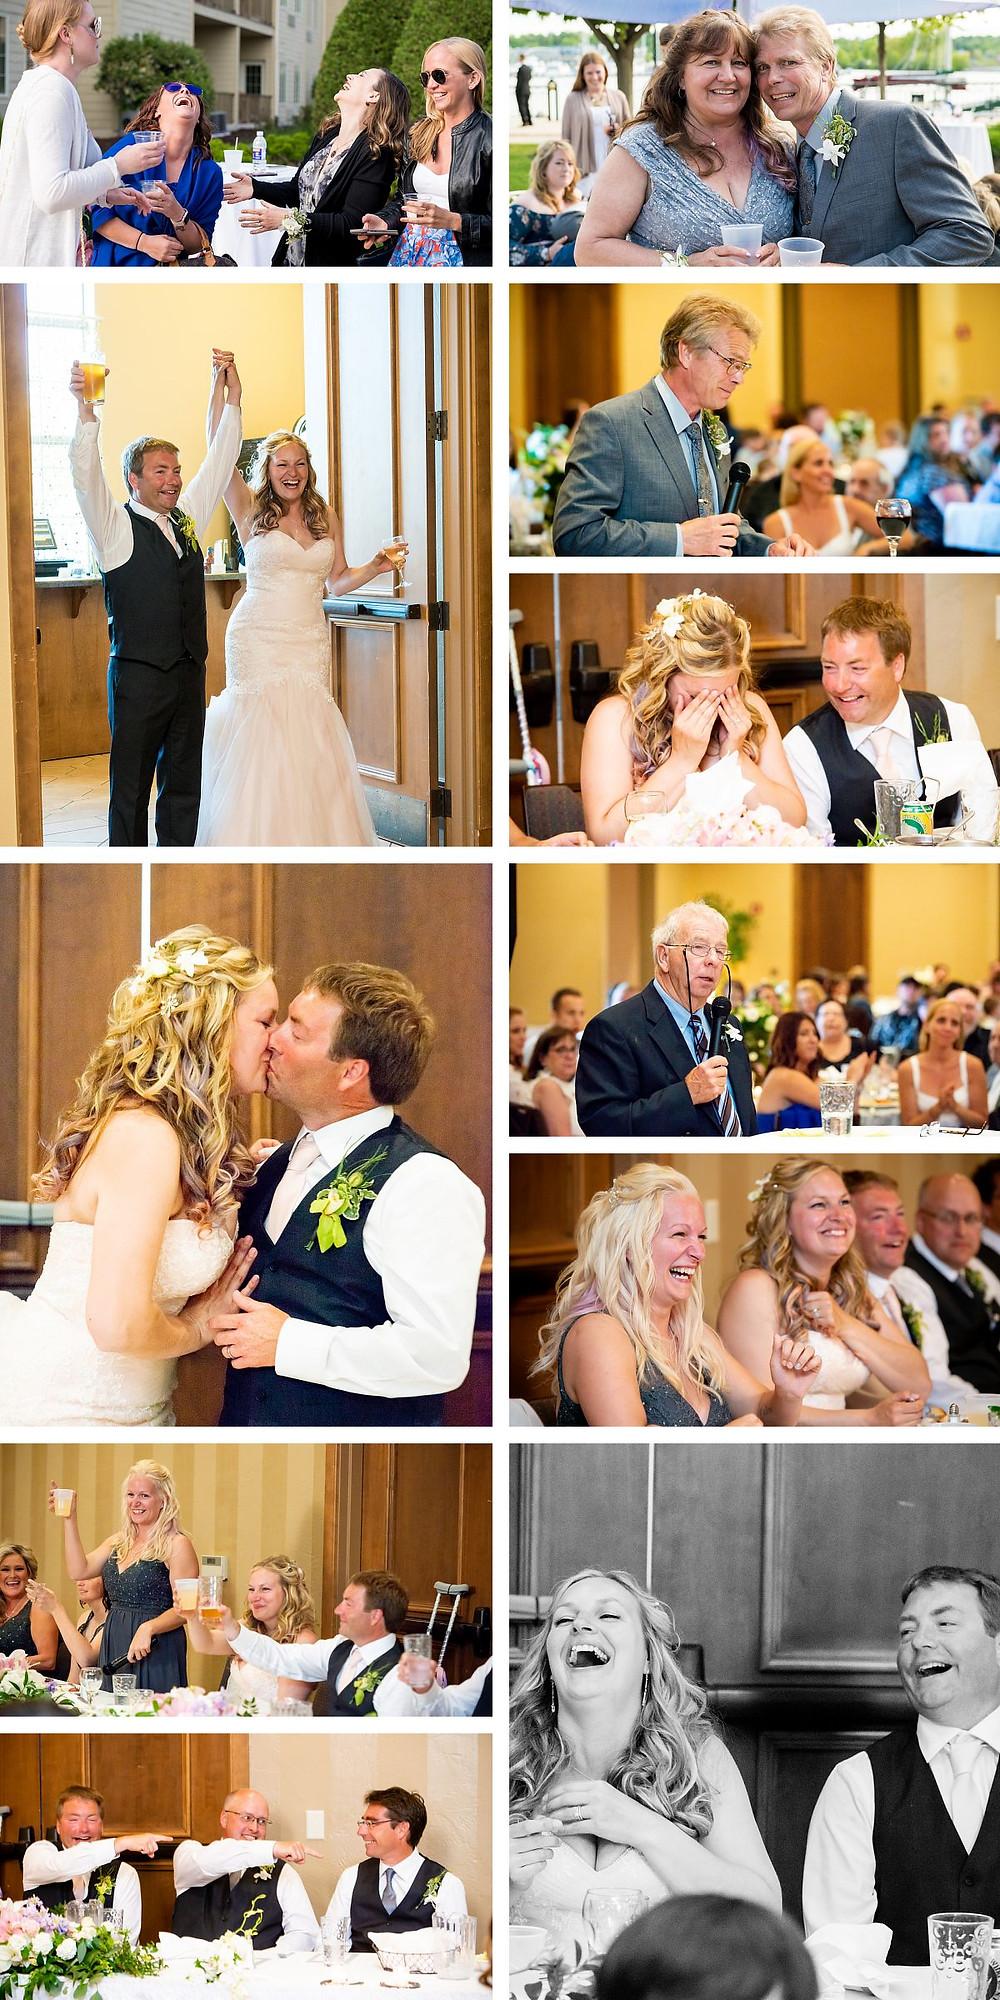 Stone Harbor Sturgeon Bay Wedding Reception Lanari Photography